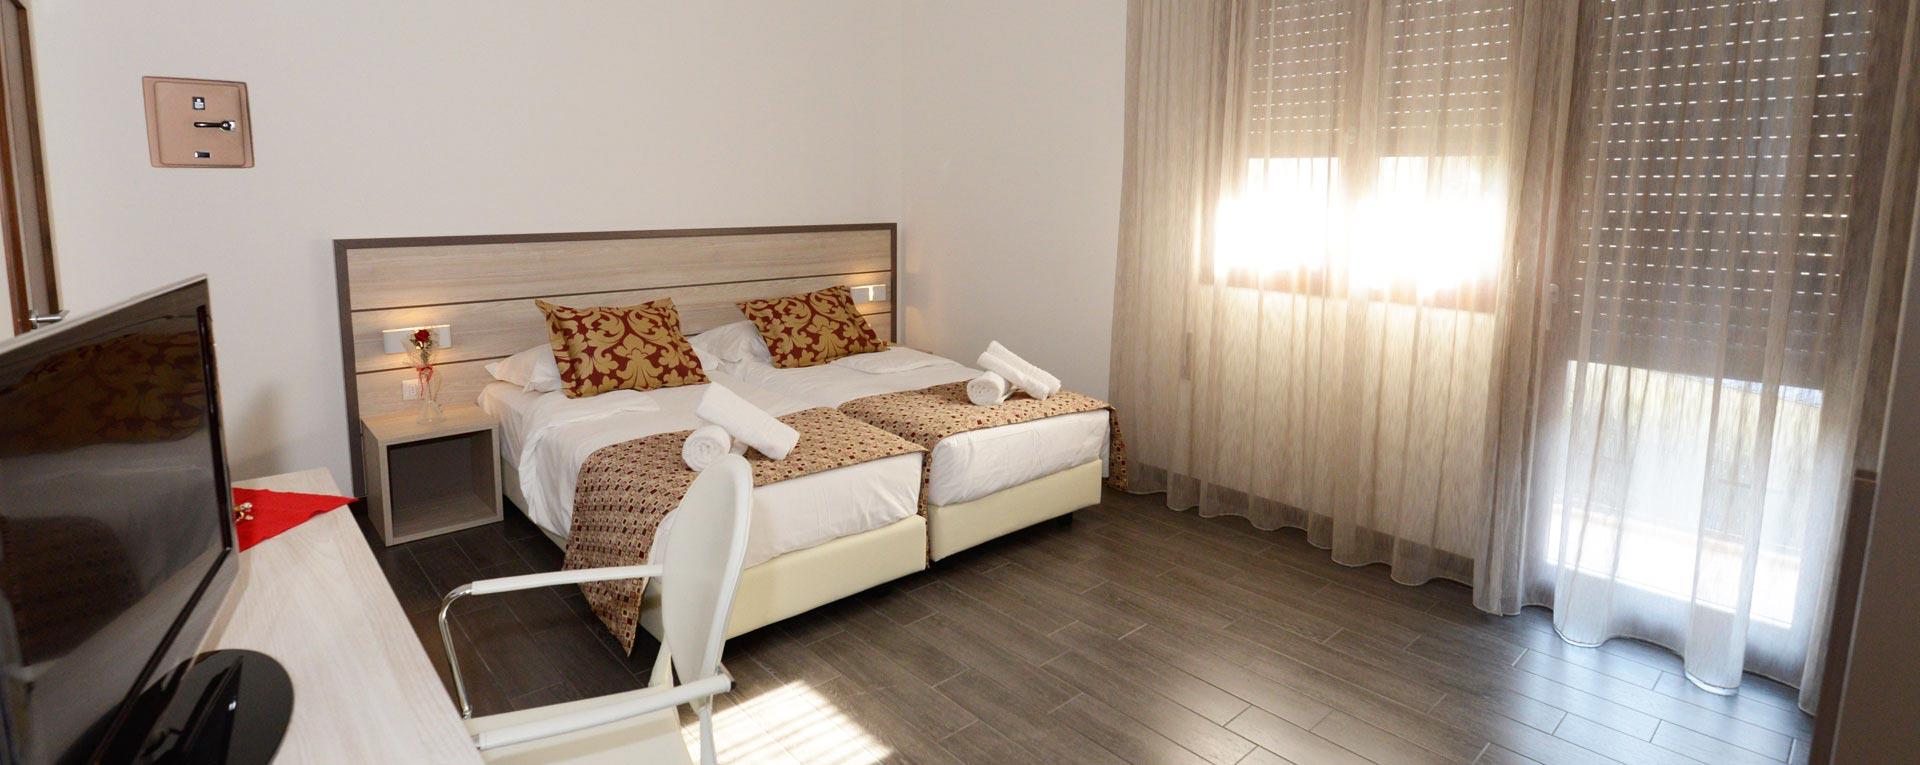 bb venice a casa da cinzia bed and breakfast in venice. Black Bedroom Furniture Sets. Home Design Ideas